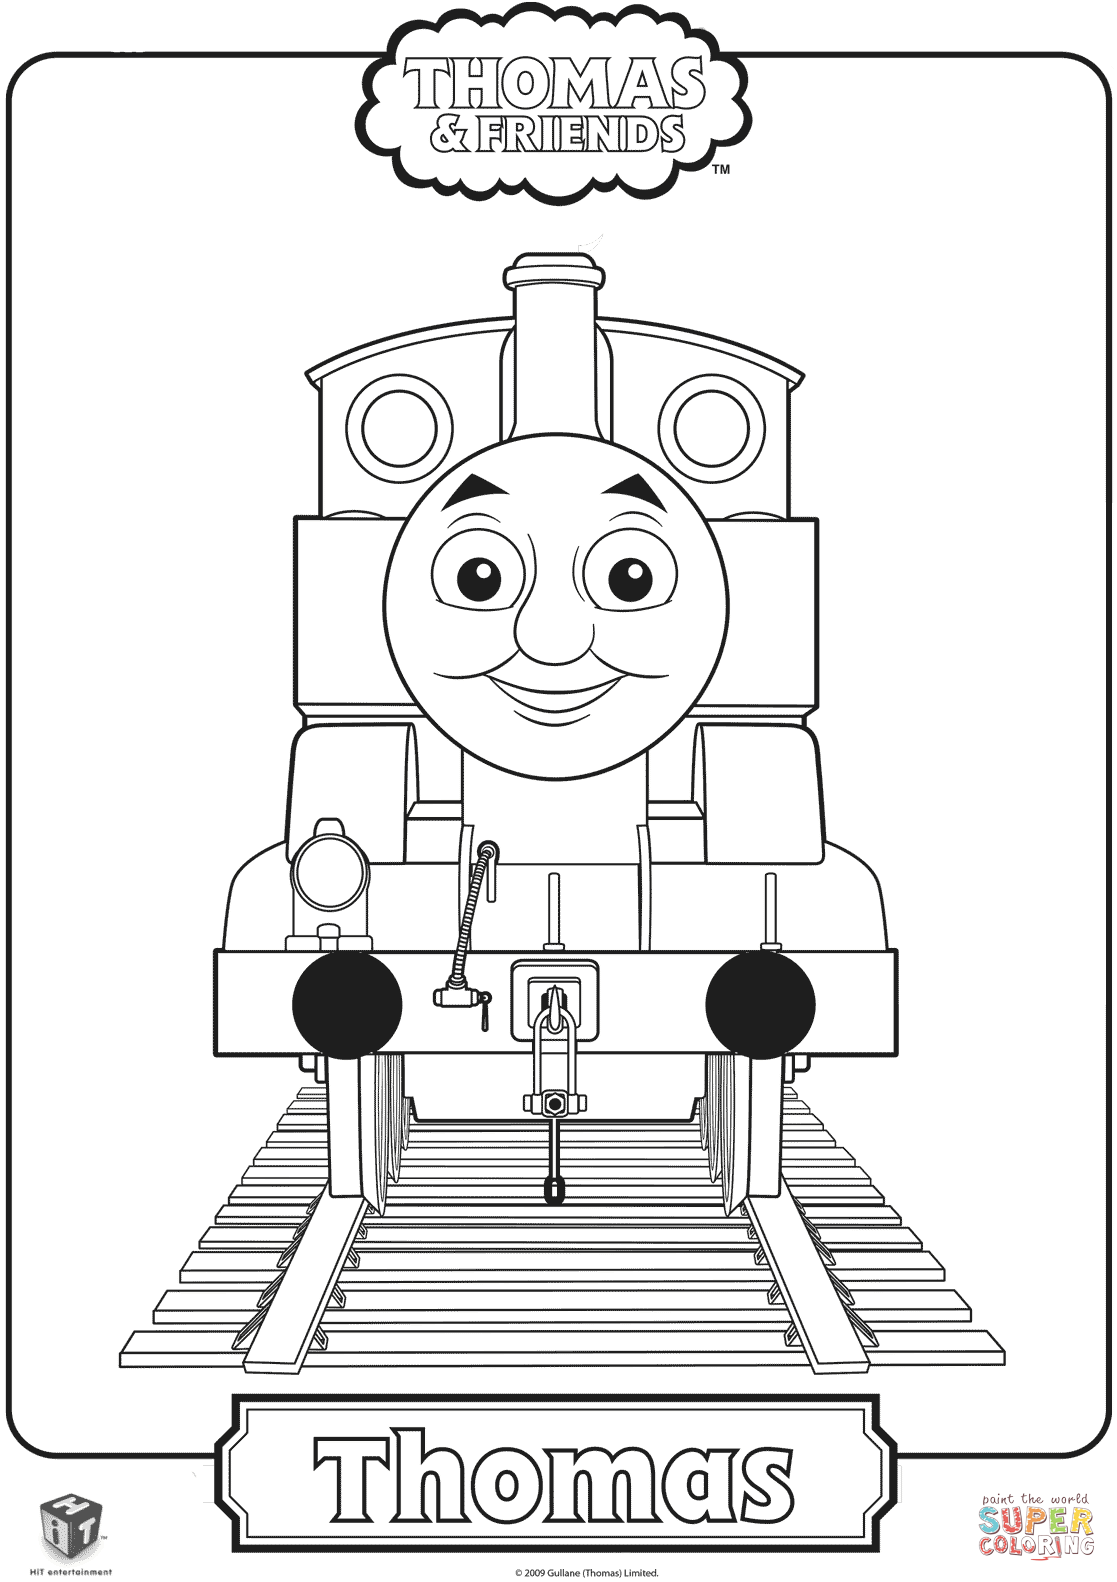 Thomas The Train Coloring Page Free Printable Coloring Pages Train Coloring Pages Birthday Coloring Pages Thomas The Train Birthday Party